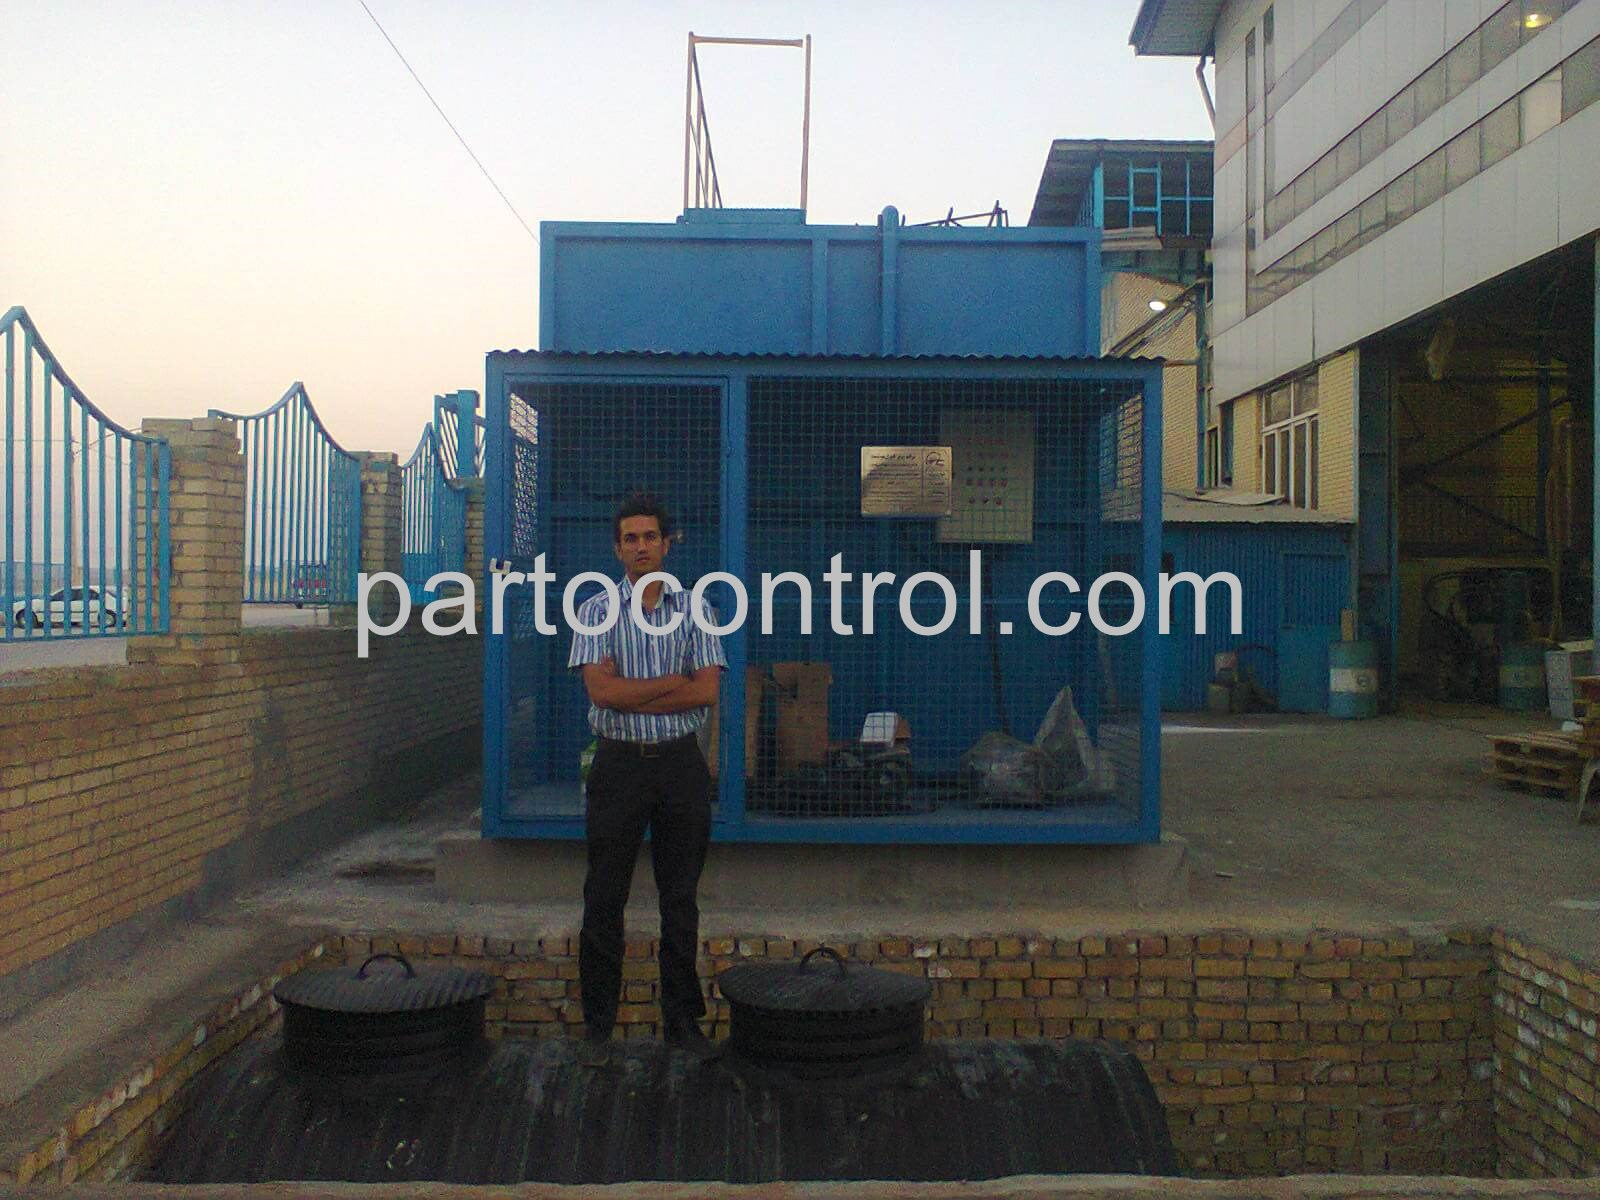 Carwash Sewage Treatment Packageتصفیه فاضلاب کارواش پلیمر گلپایگان4 - پروژه تصفیه فاضلاب کارواش